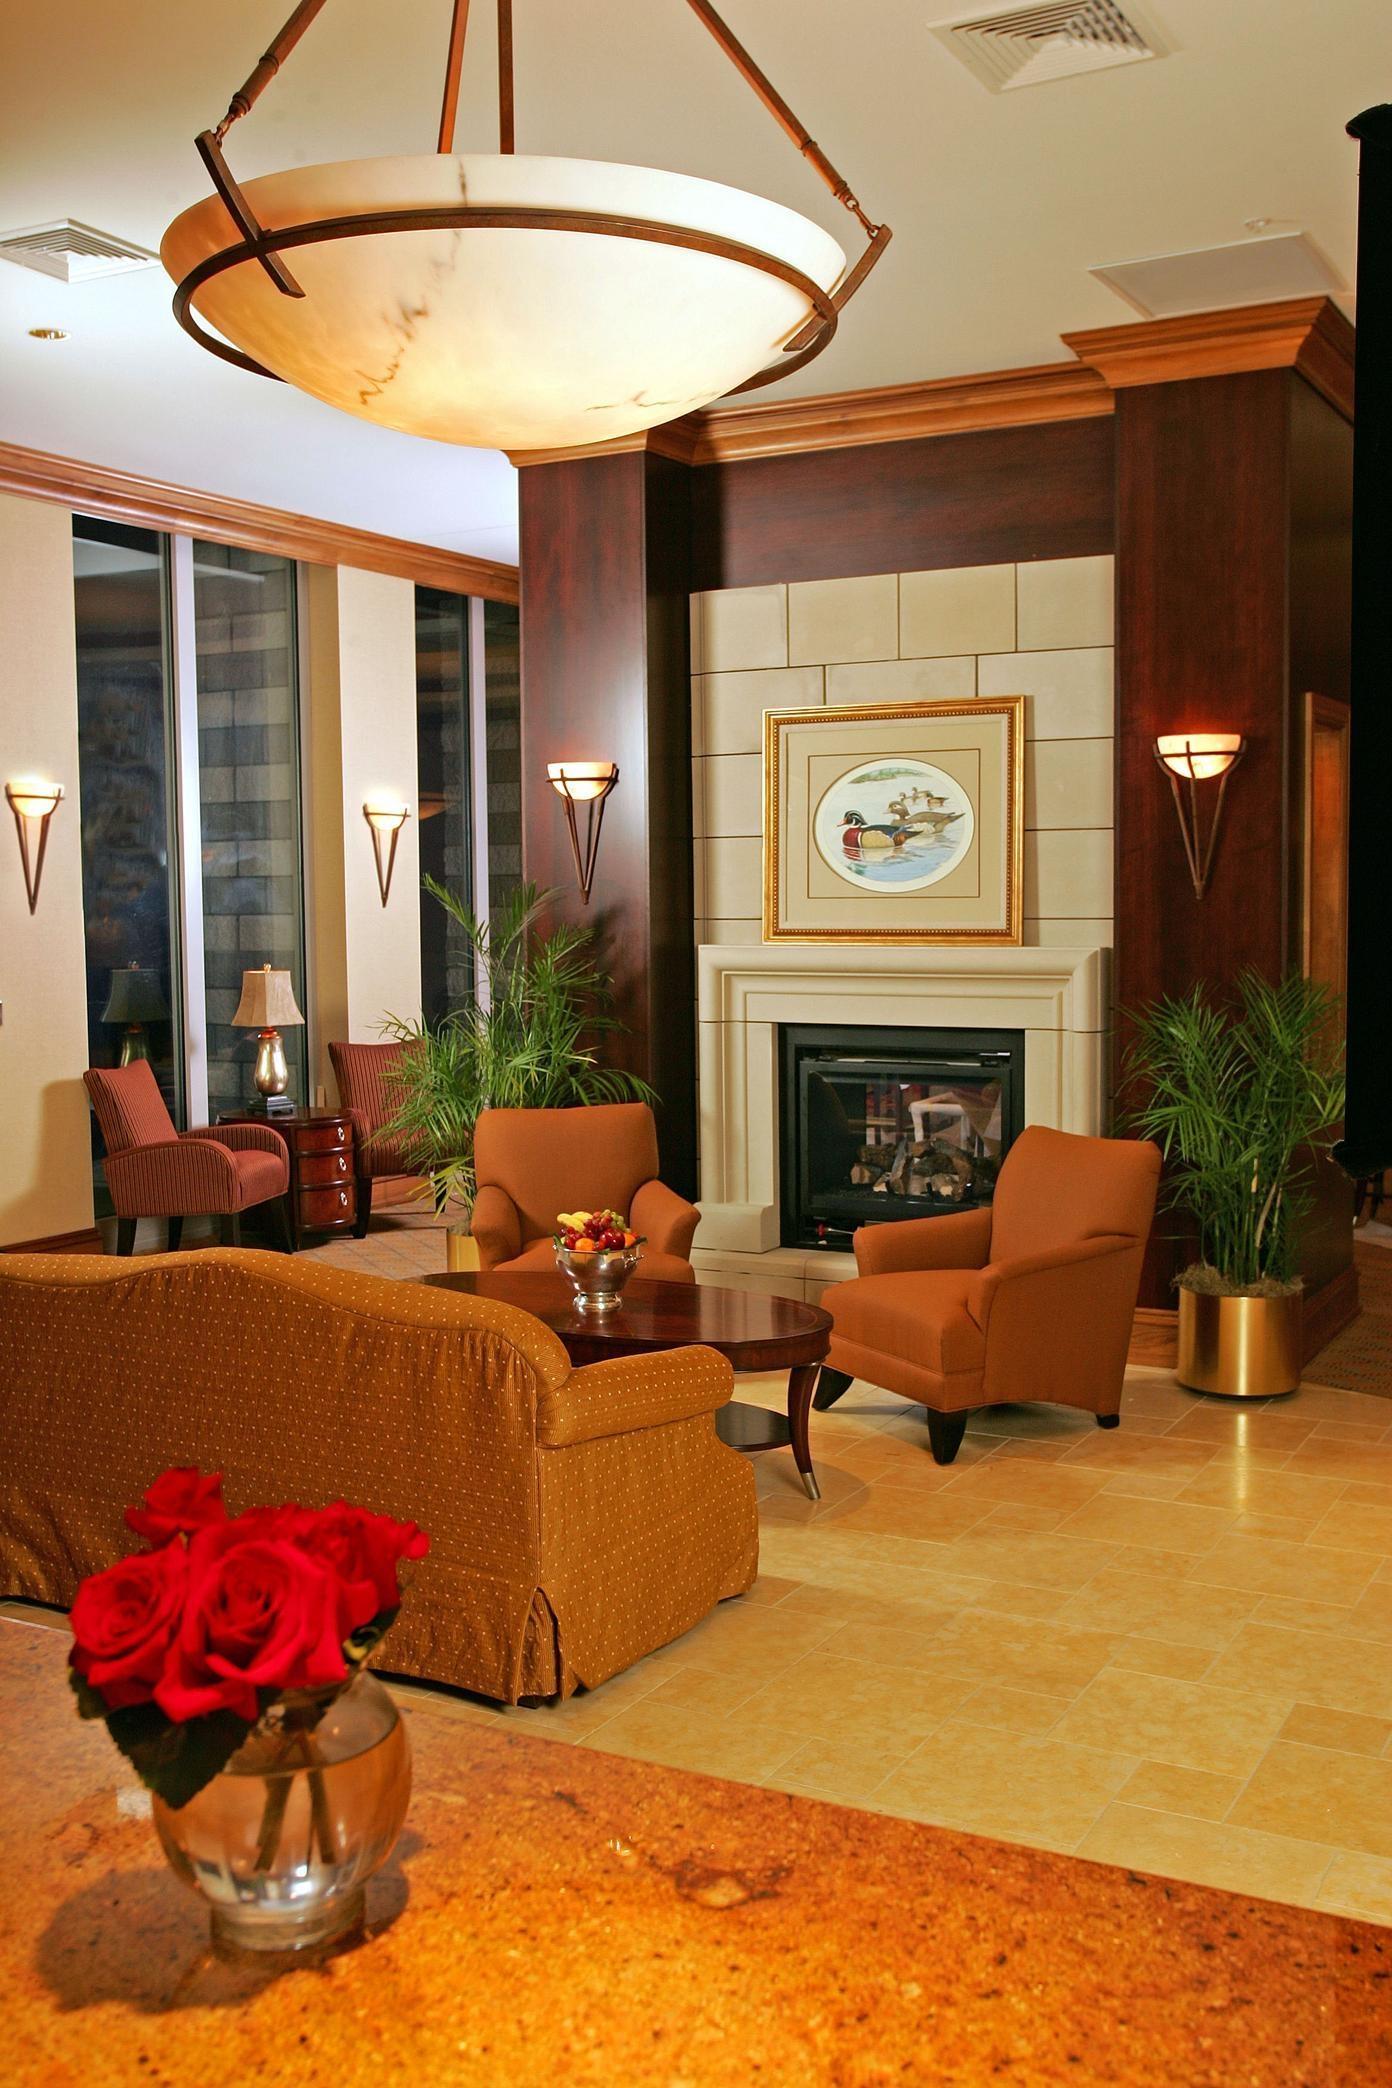 Homewood Suites by Hilton Philadelphia-City Avenue image 1